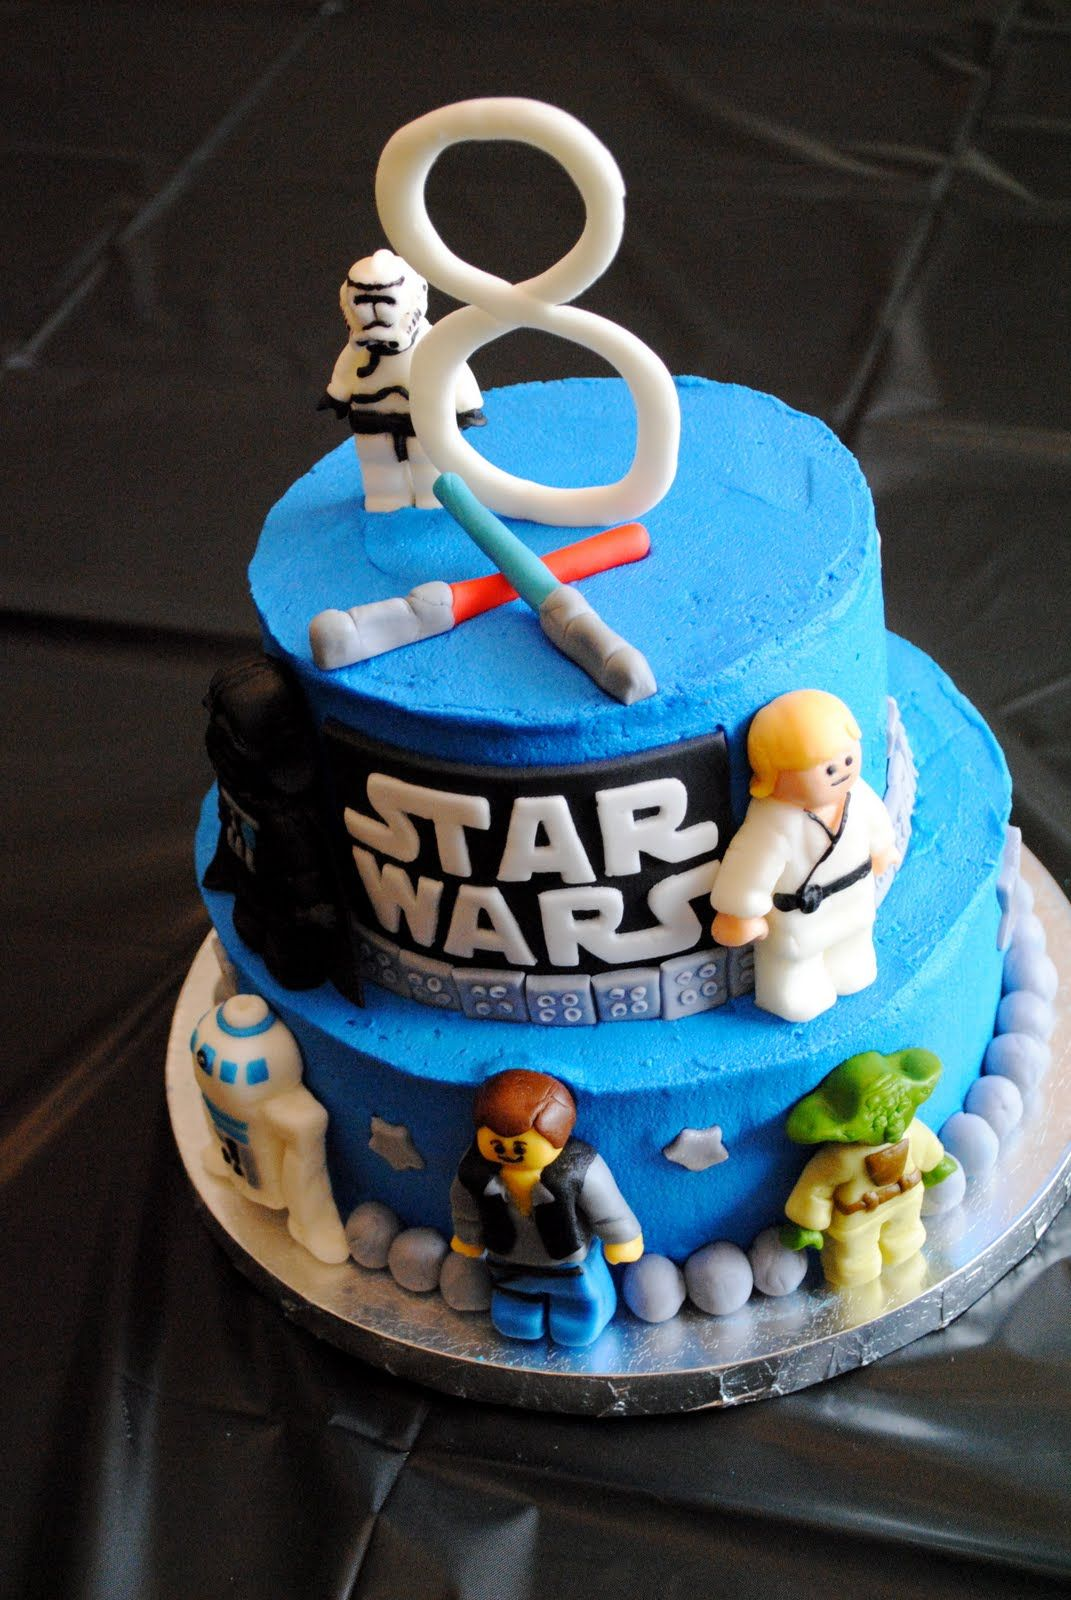 Lego Star Wars Old Republic Cake My Boys Had Their First Lesson On